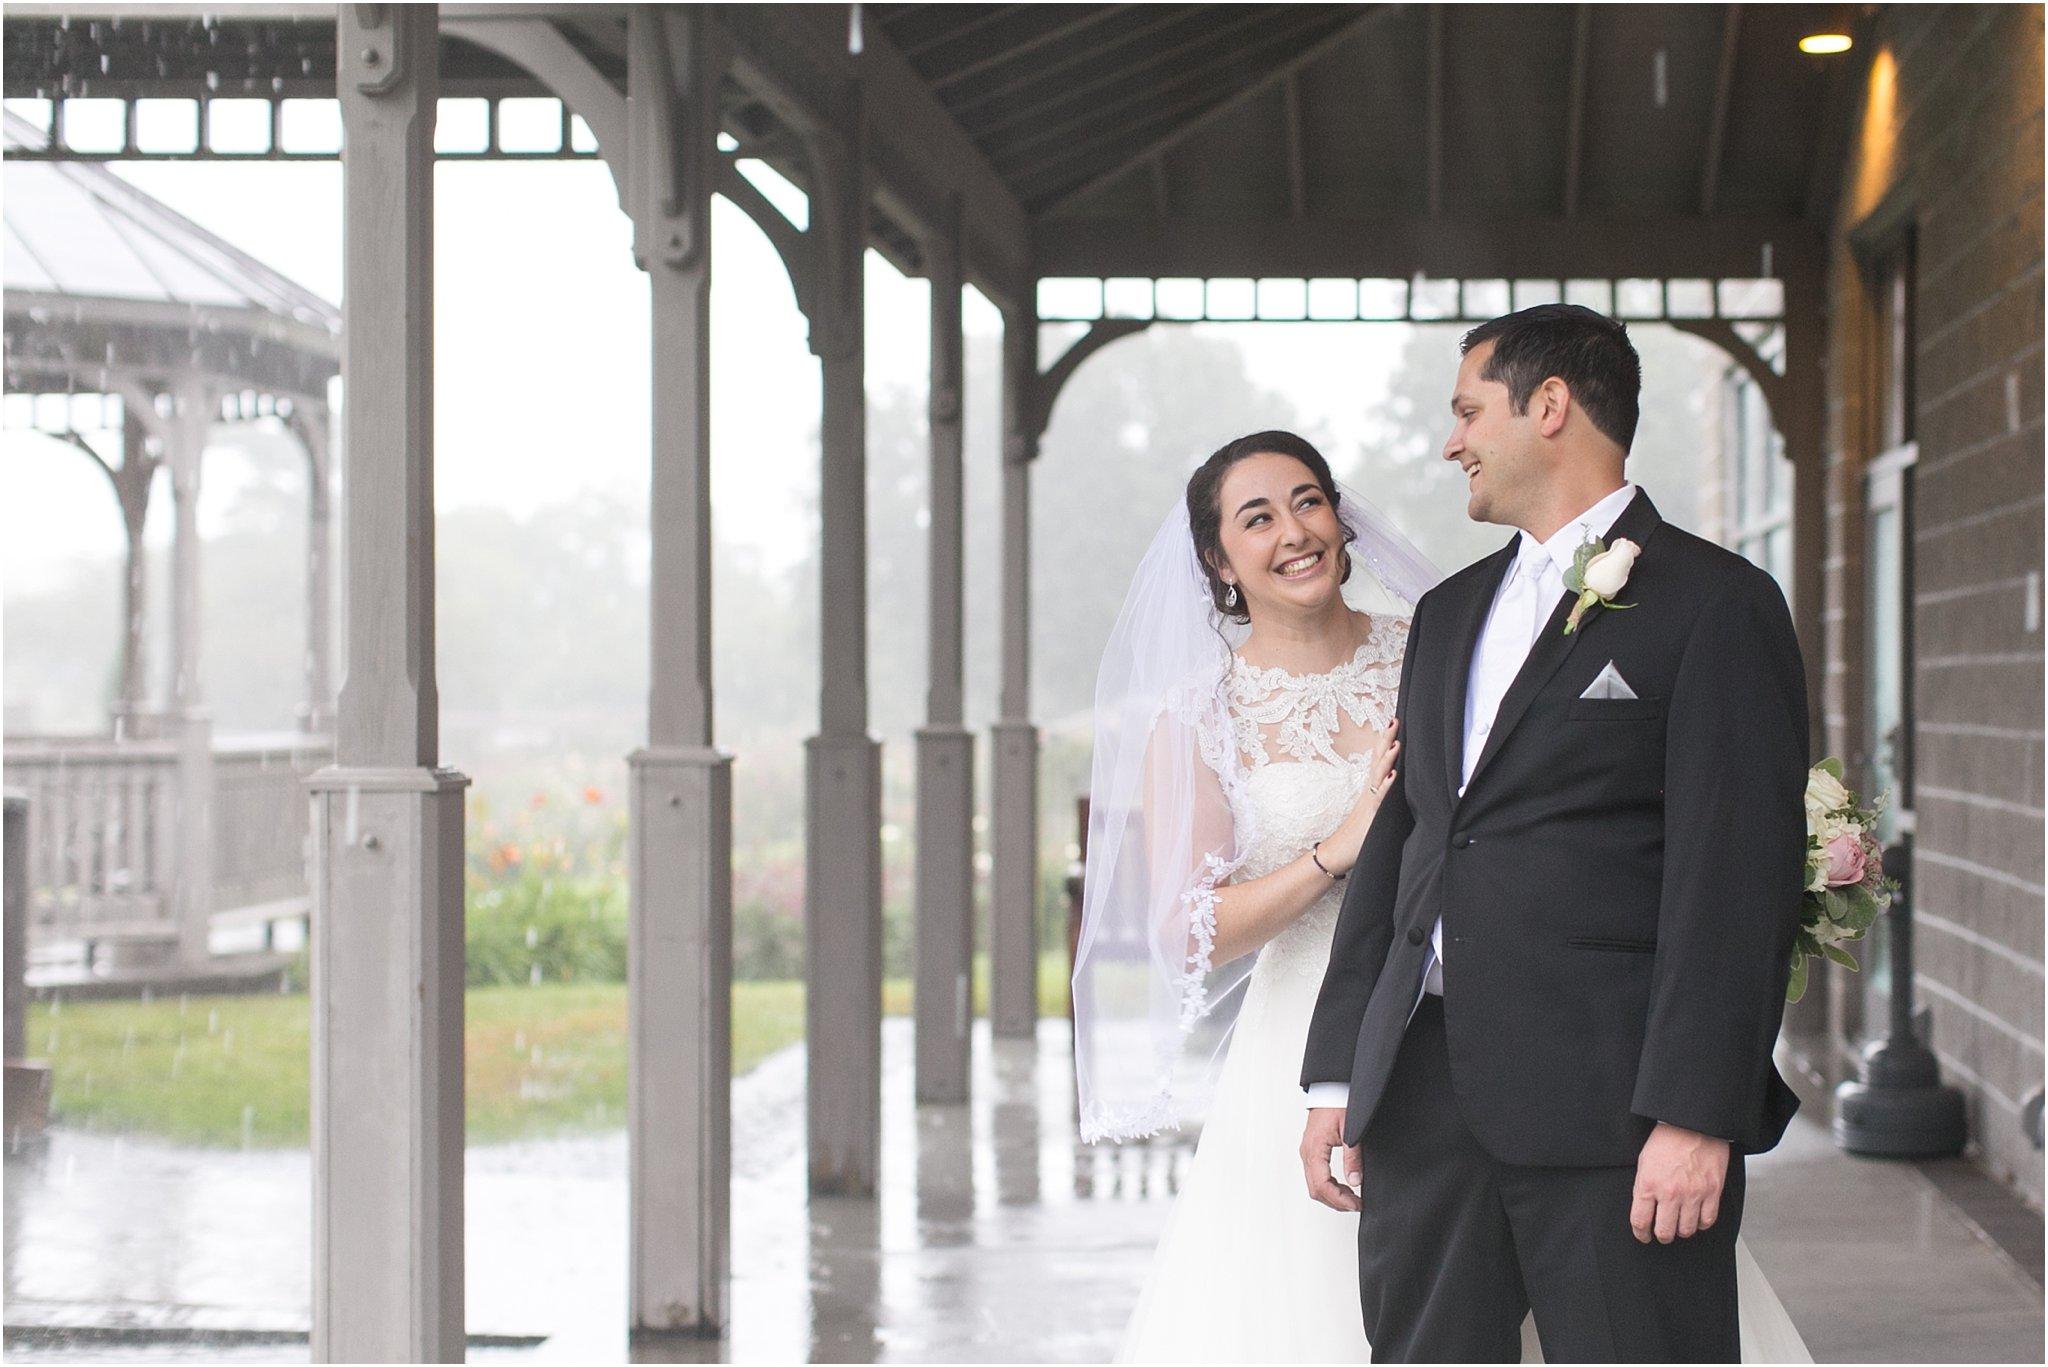 jessica_ryan_photography_virginia_wedding_photographer_wedding_hurricane_norfolk_botanical_gardens_hurricane_matthew_wedding_3562